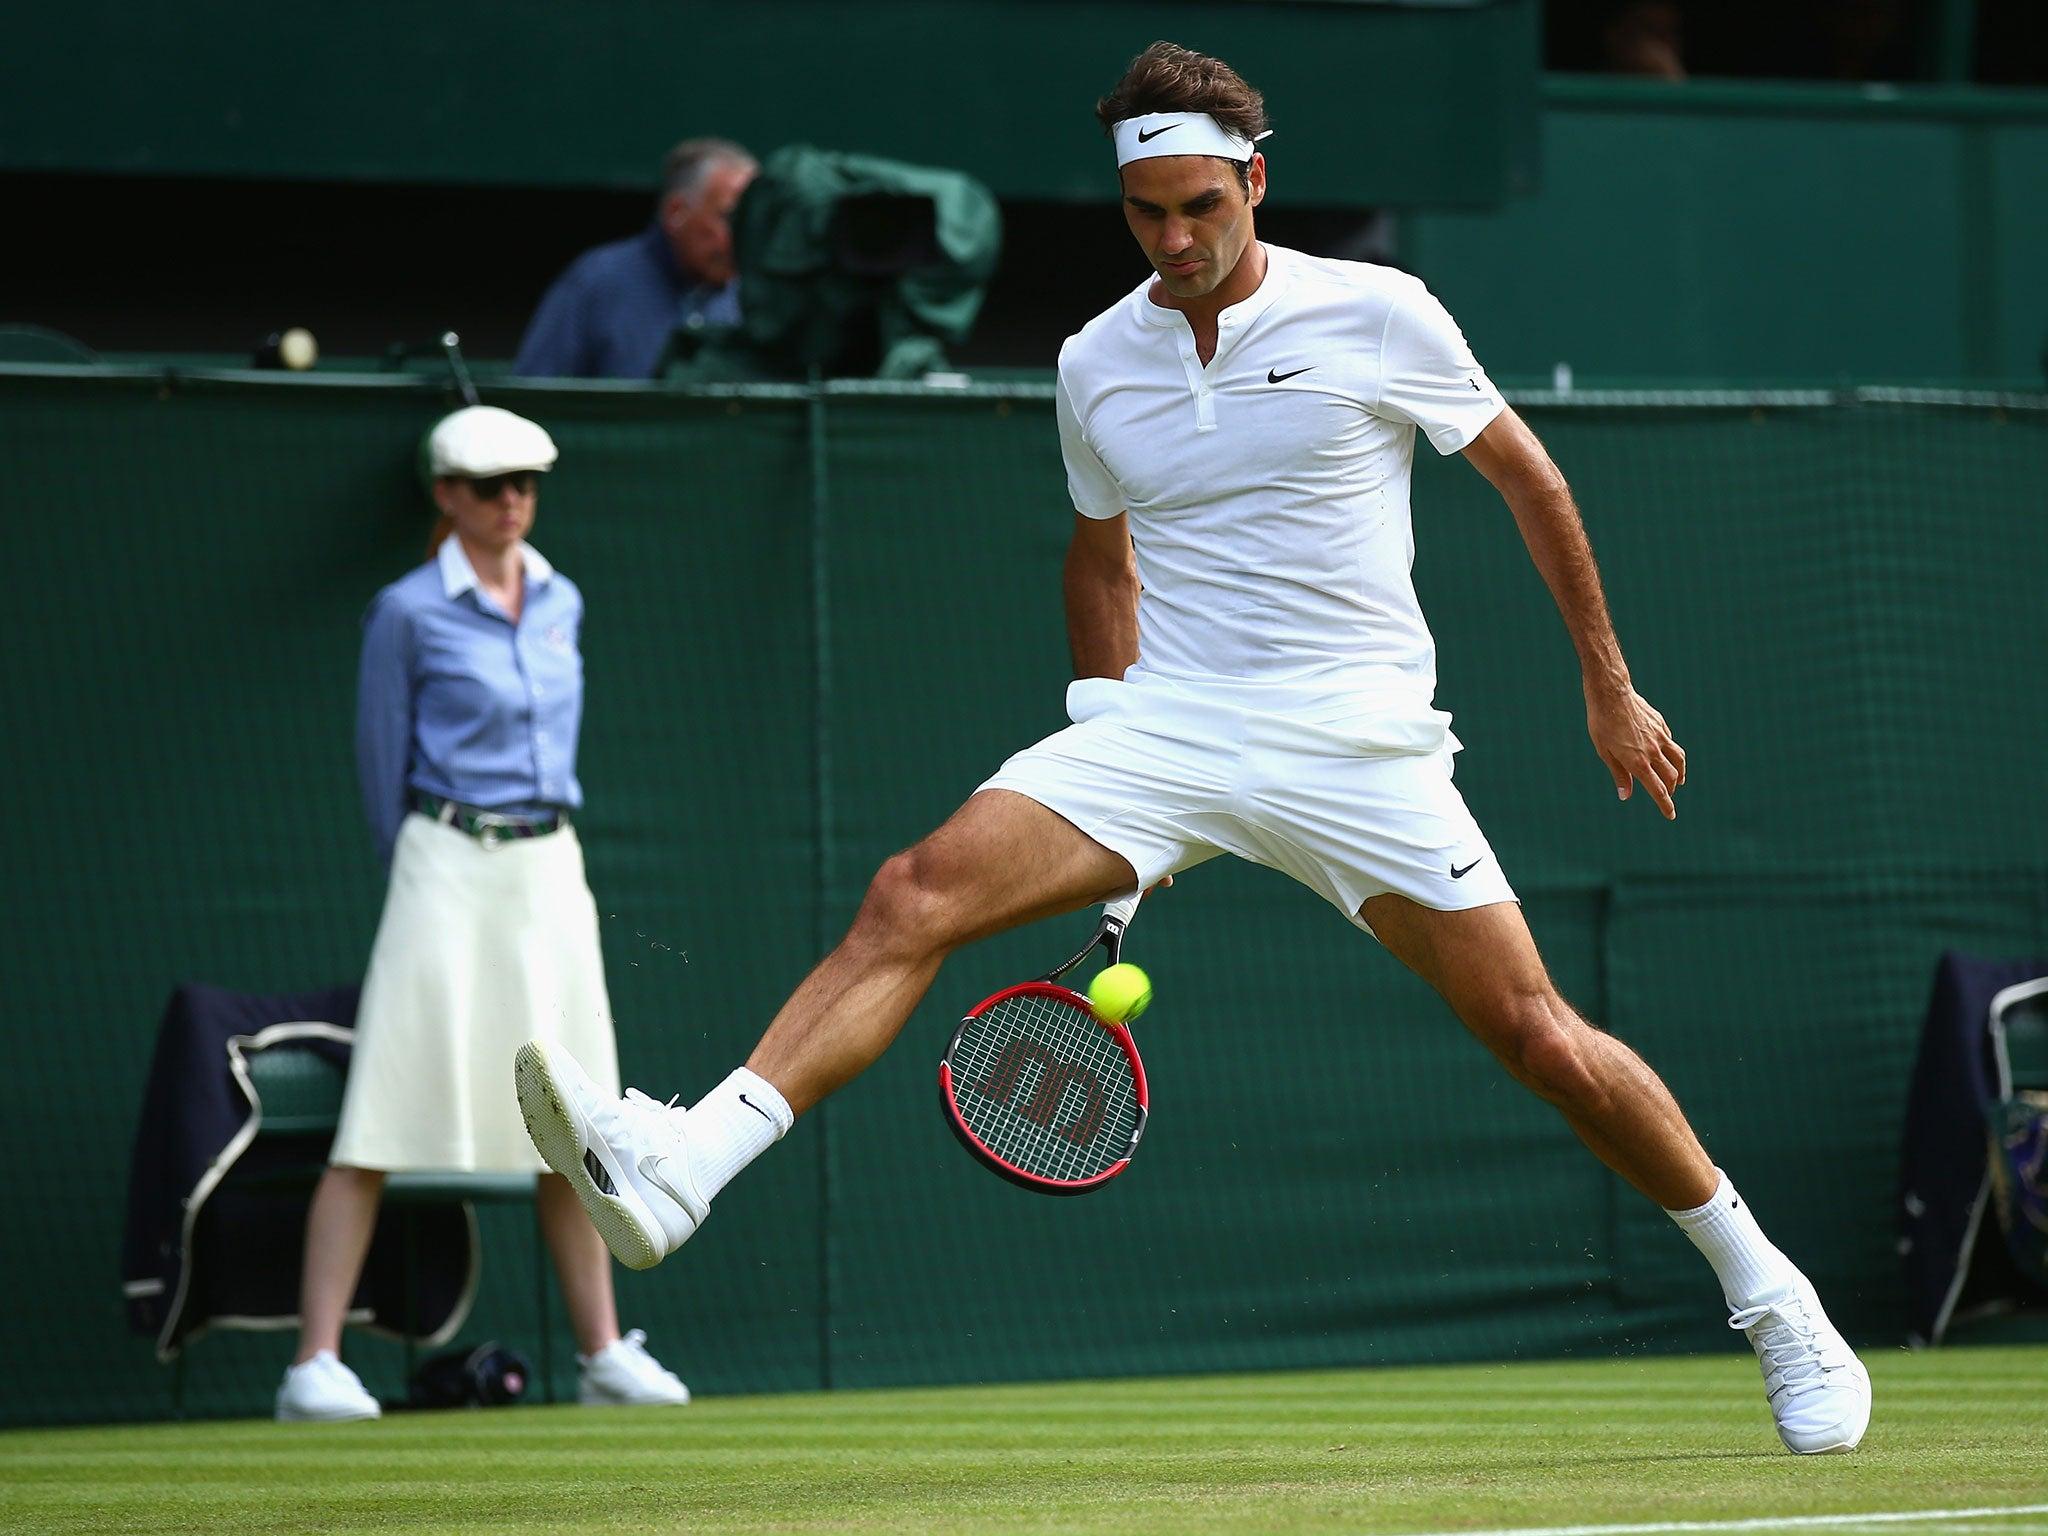 Фото между ног в спорте 10 фотография